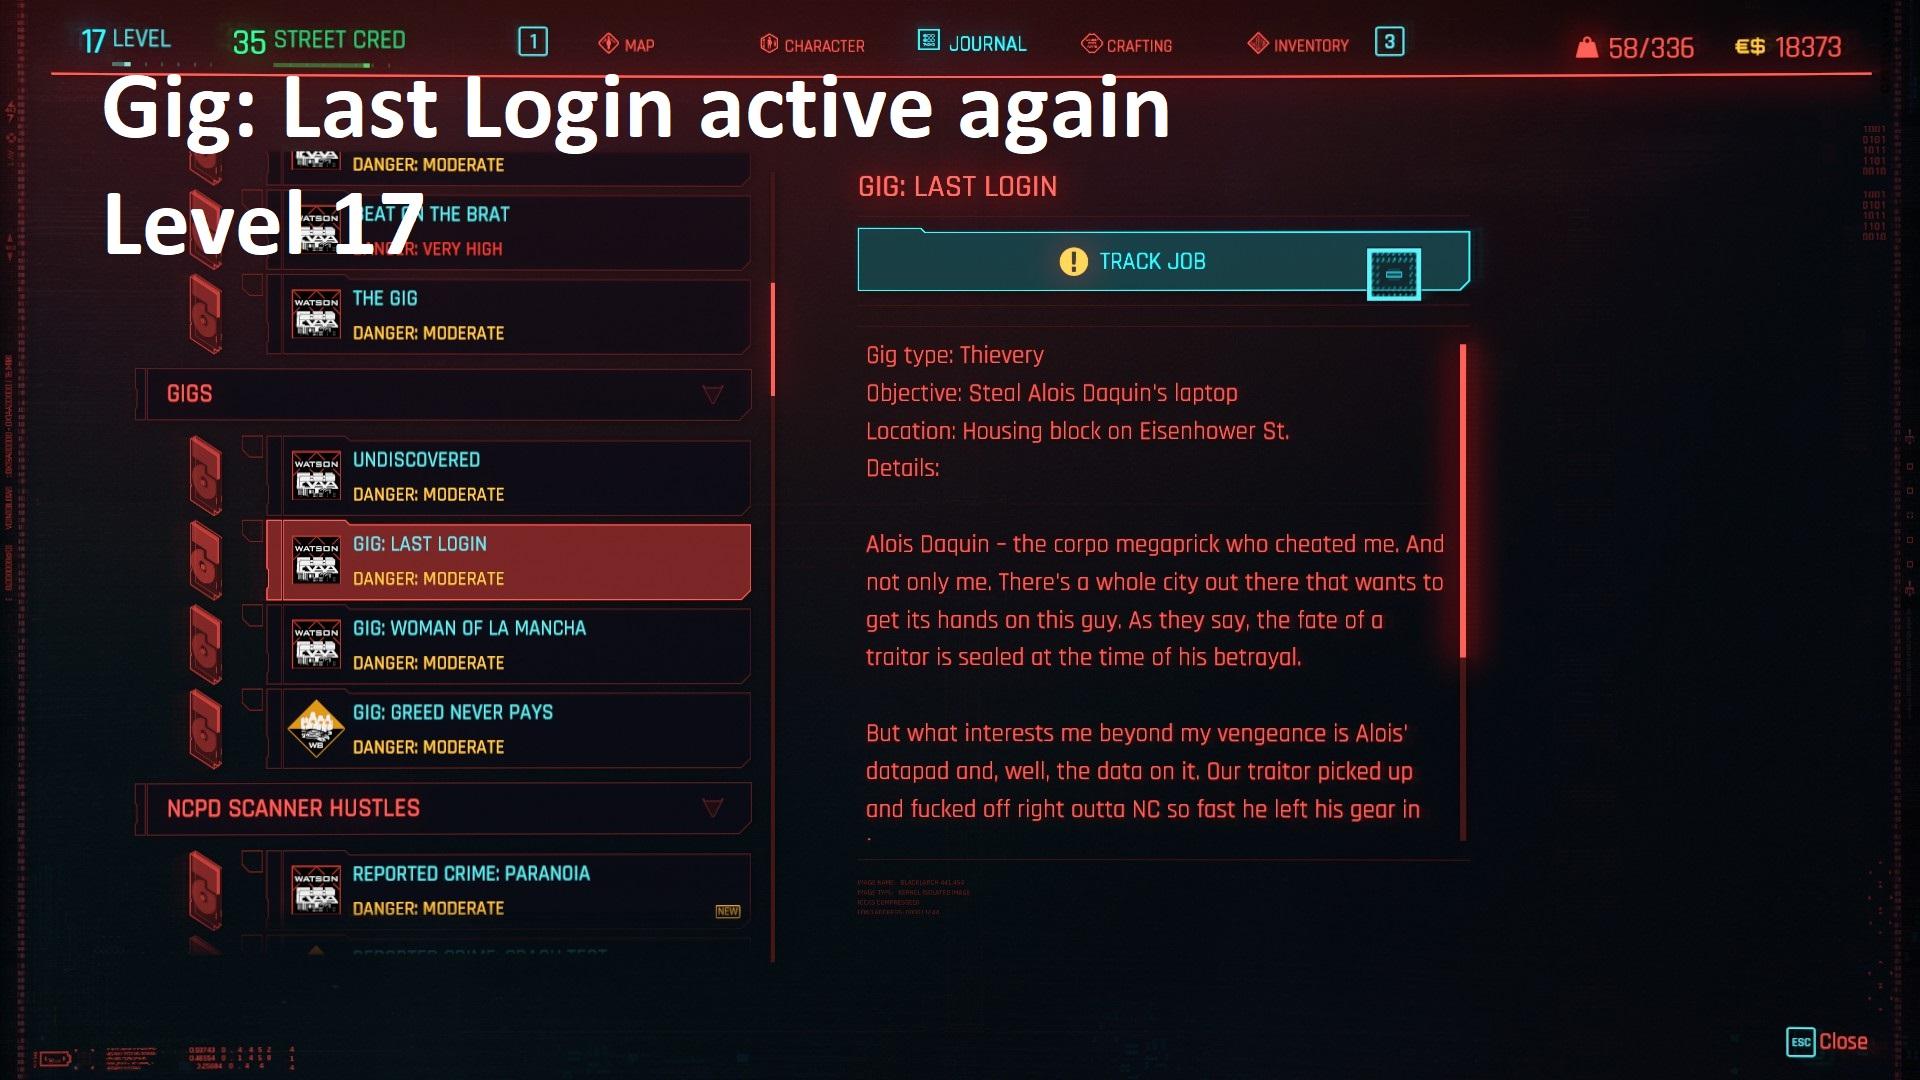 3_last_login_track_job.jpg